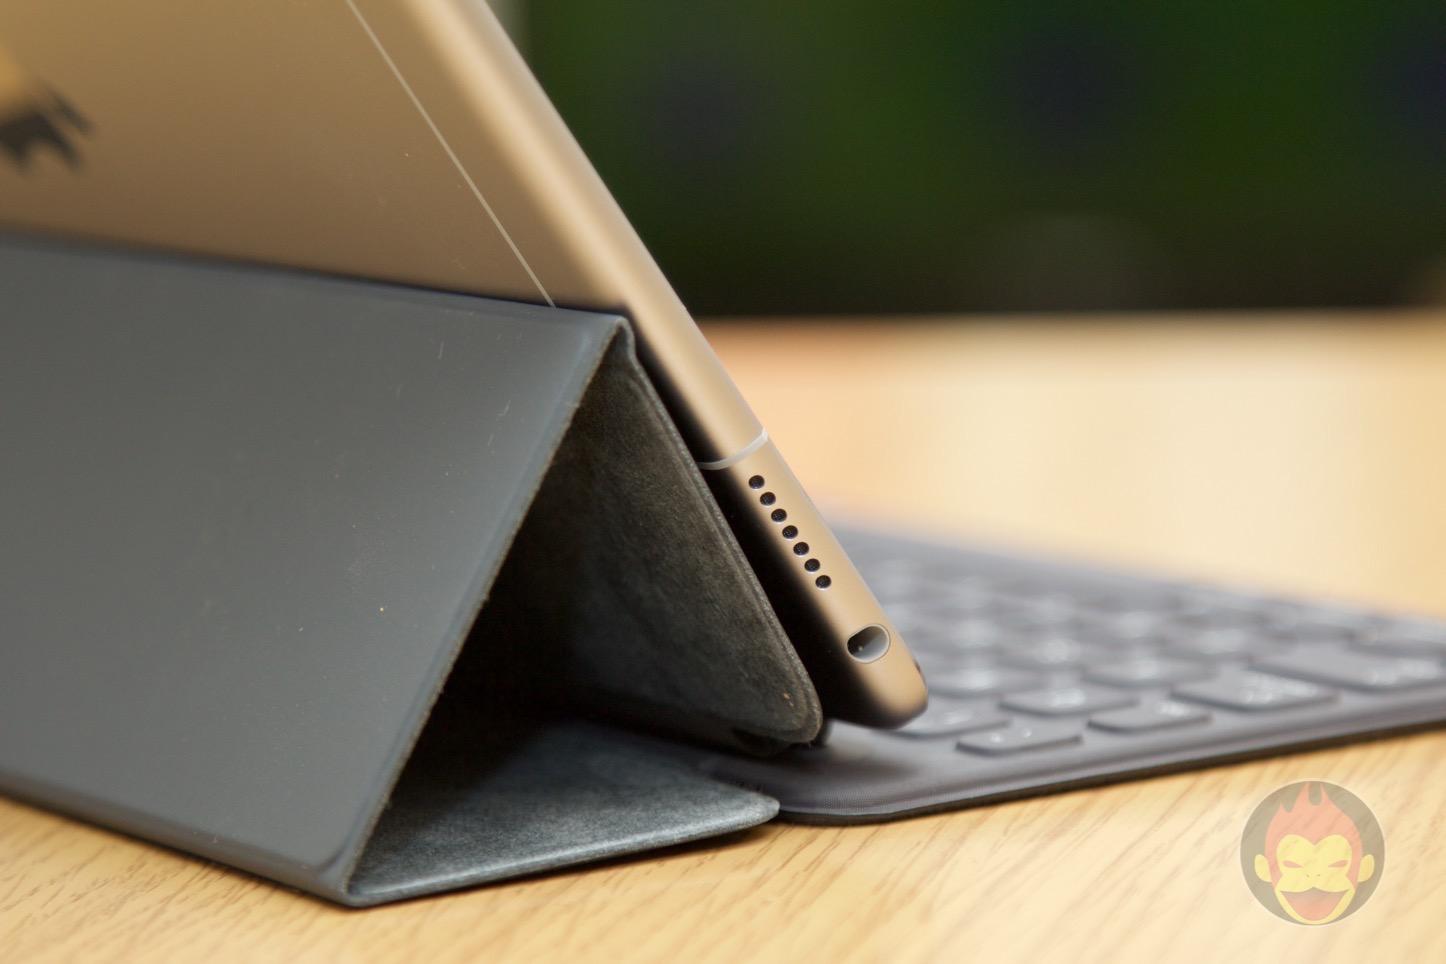 IPad Pro Smart Keyboard 128GB Photo Review